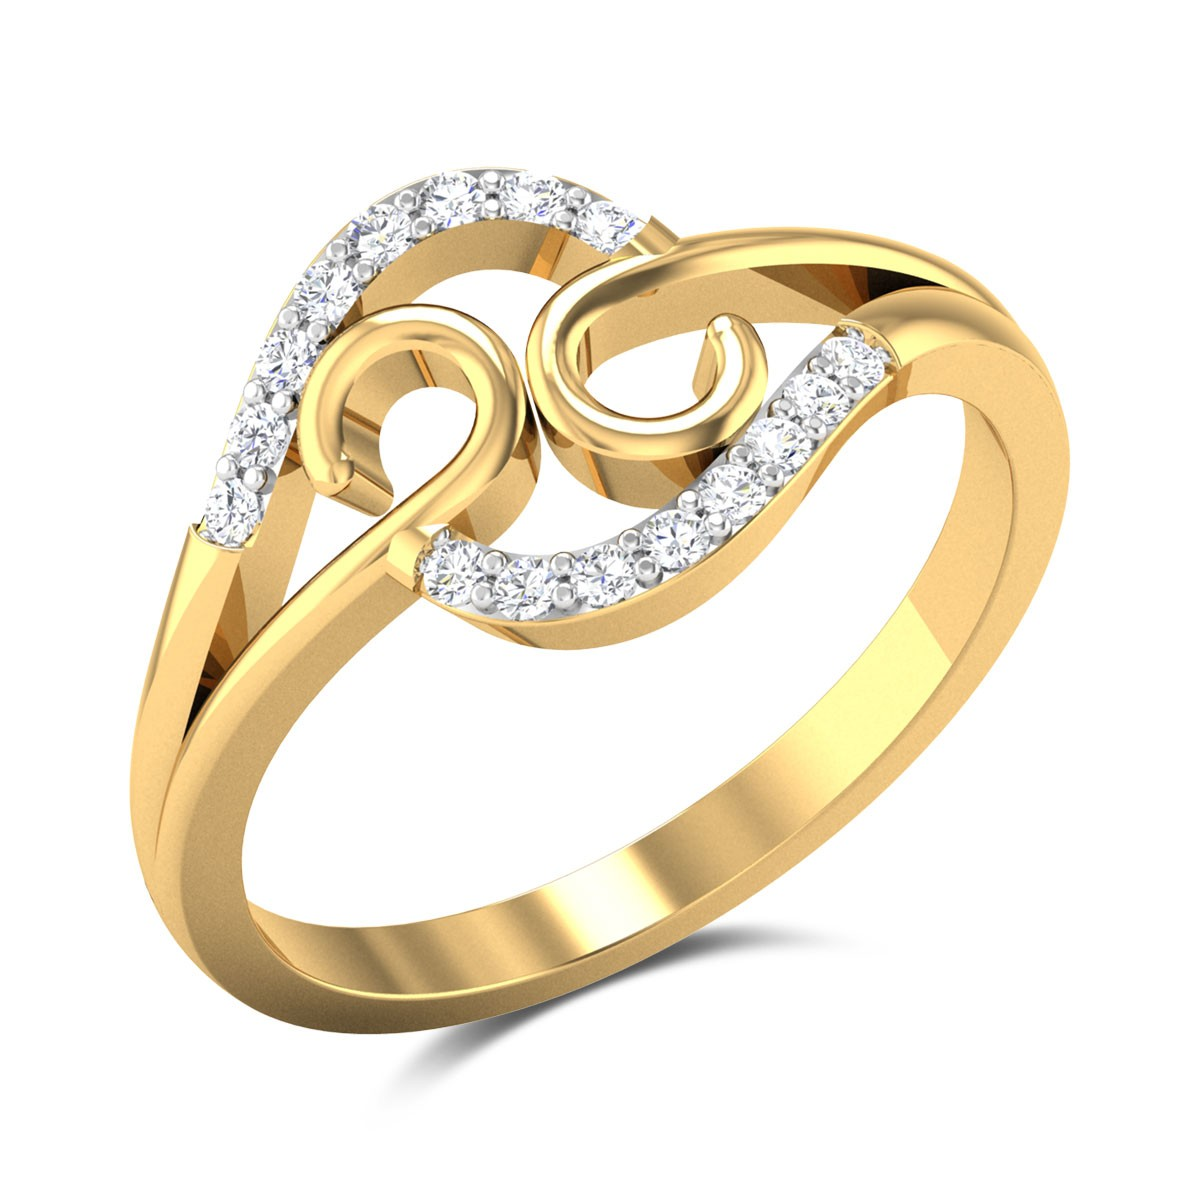 A La Modep Diamond Ring